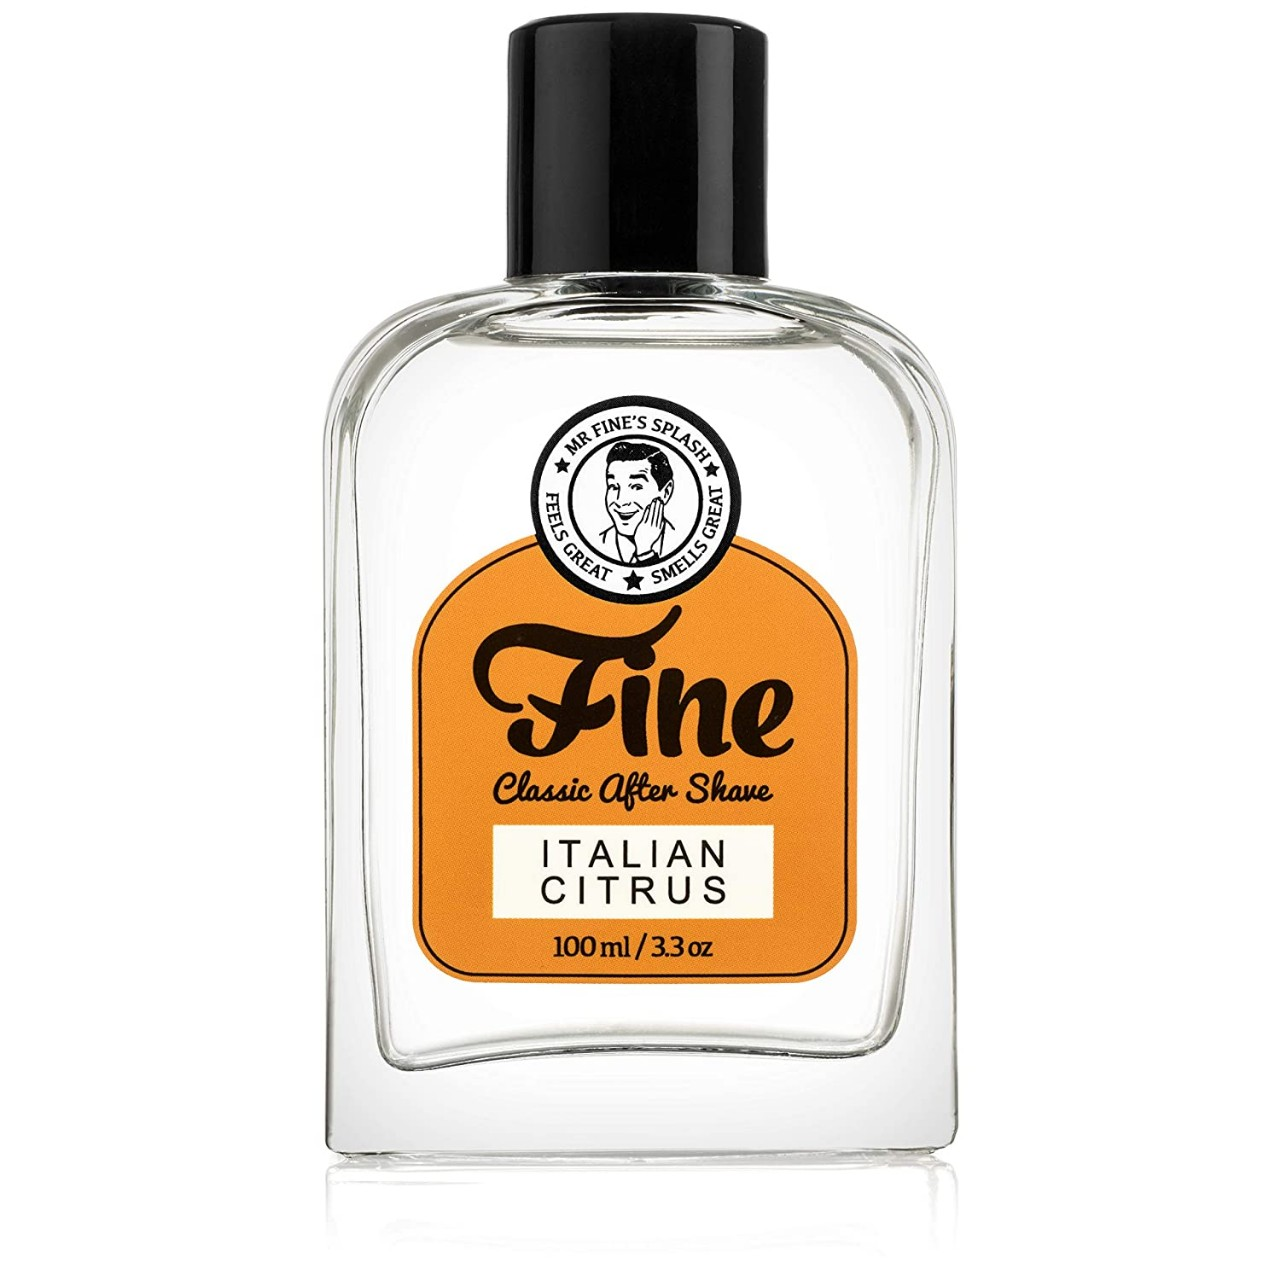 Fine Italian Citrus Mens Aftershave -A Splash Of Classic Barbershop Aftershave for Modern Men